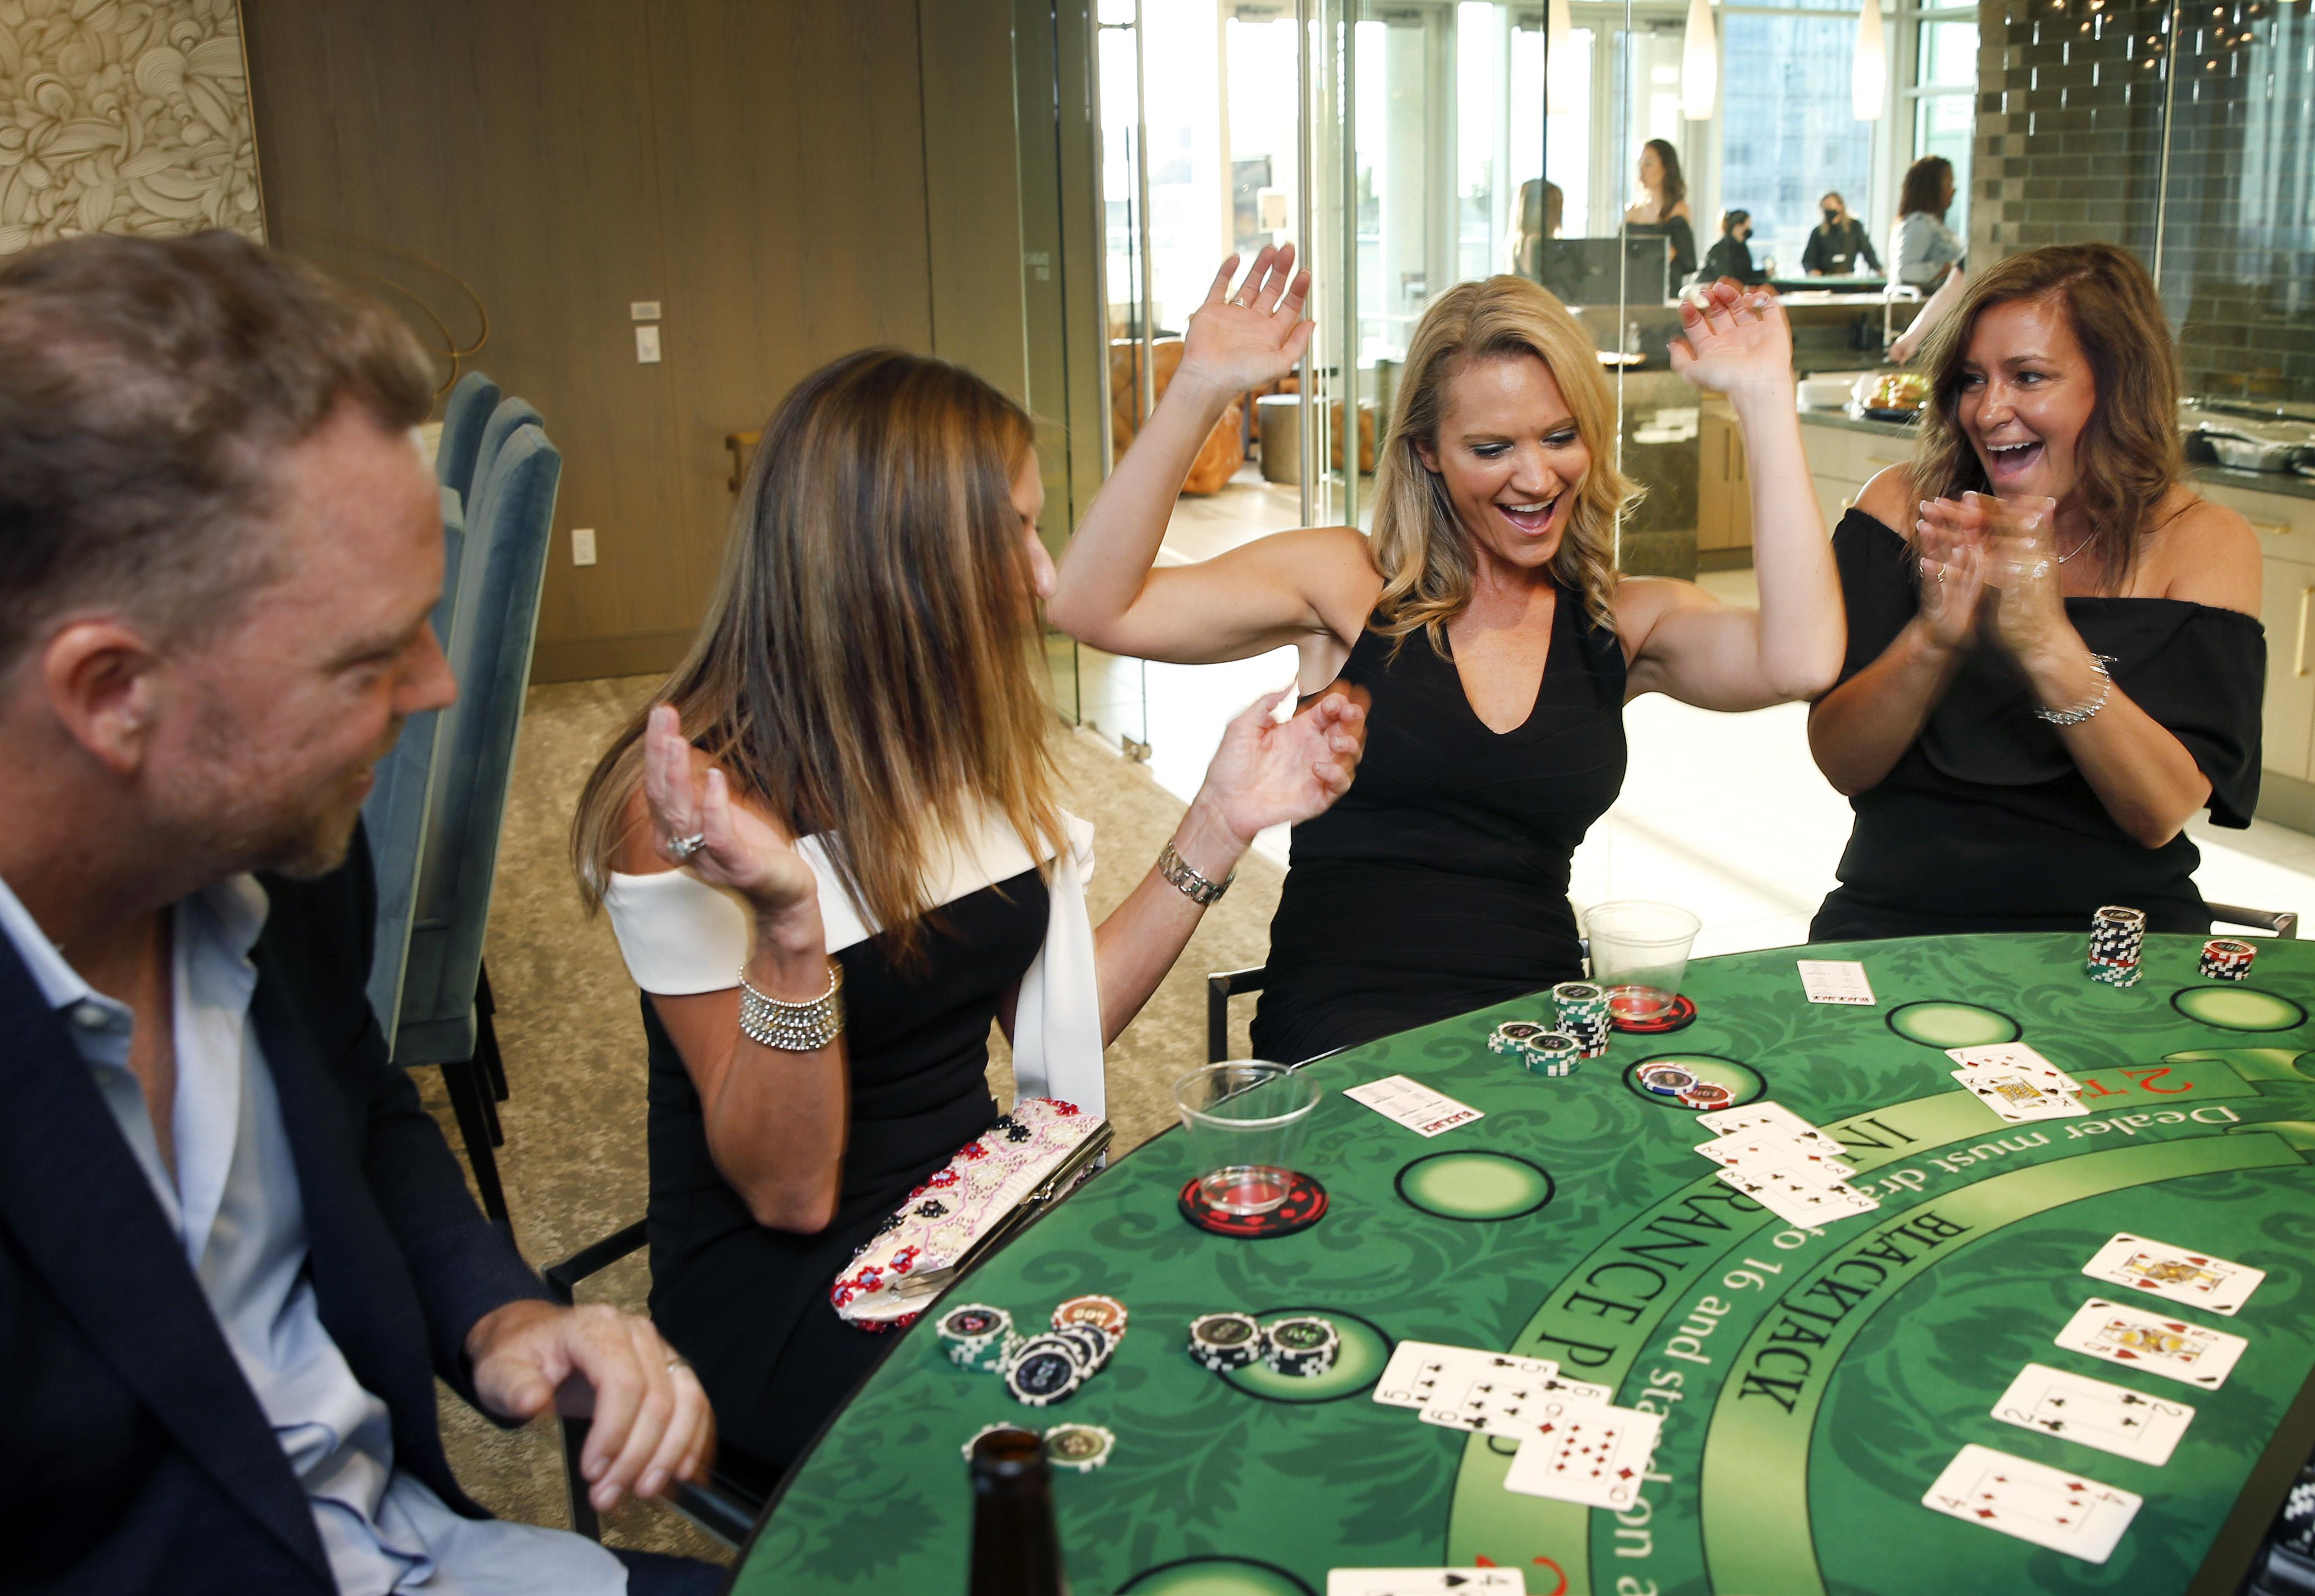 1000 PBN Casino or adult or escort or gambling site SEO permanen backlinks